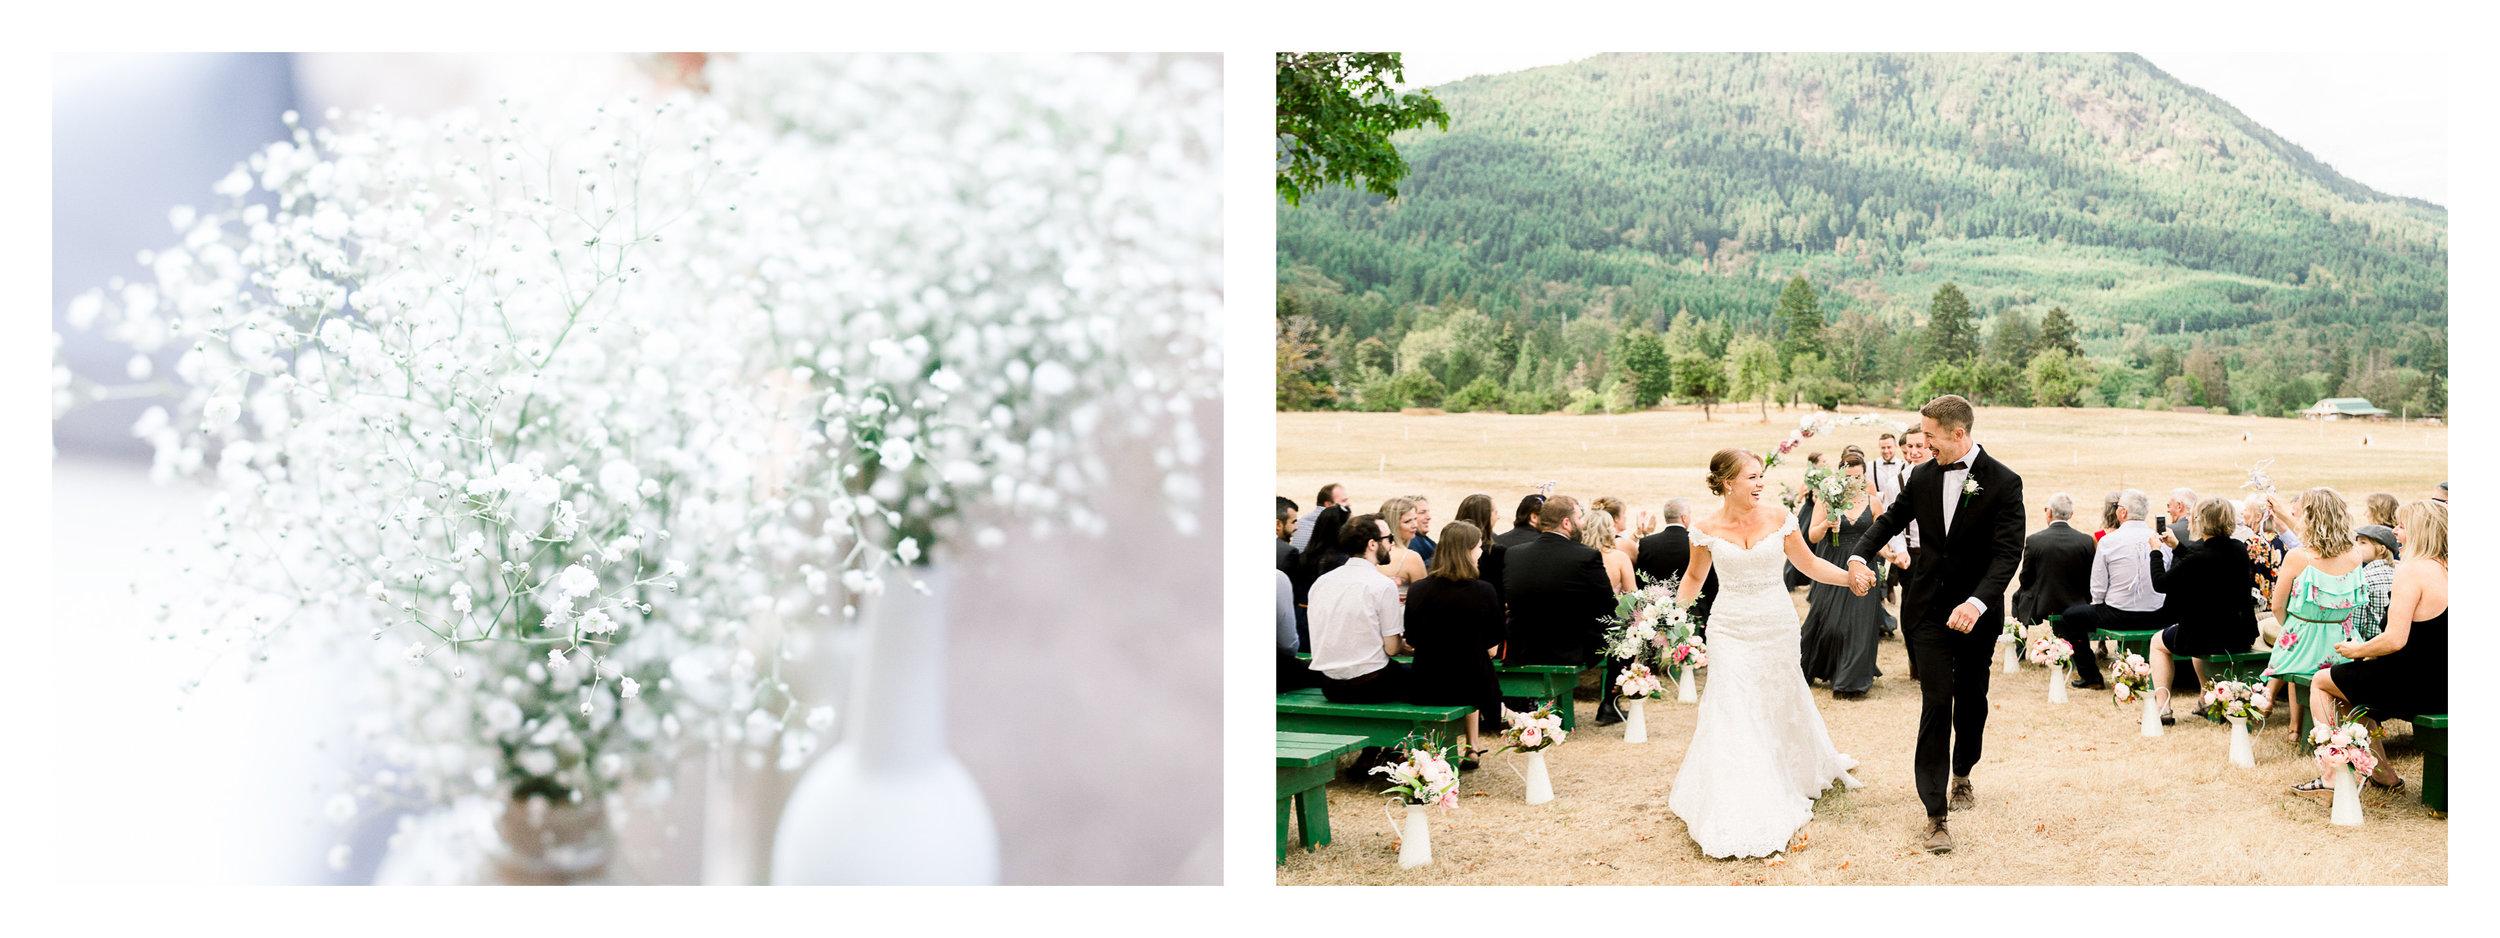 Vancouver-Wedding-Photographer-2.jpg